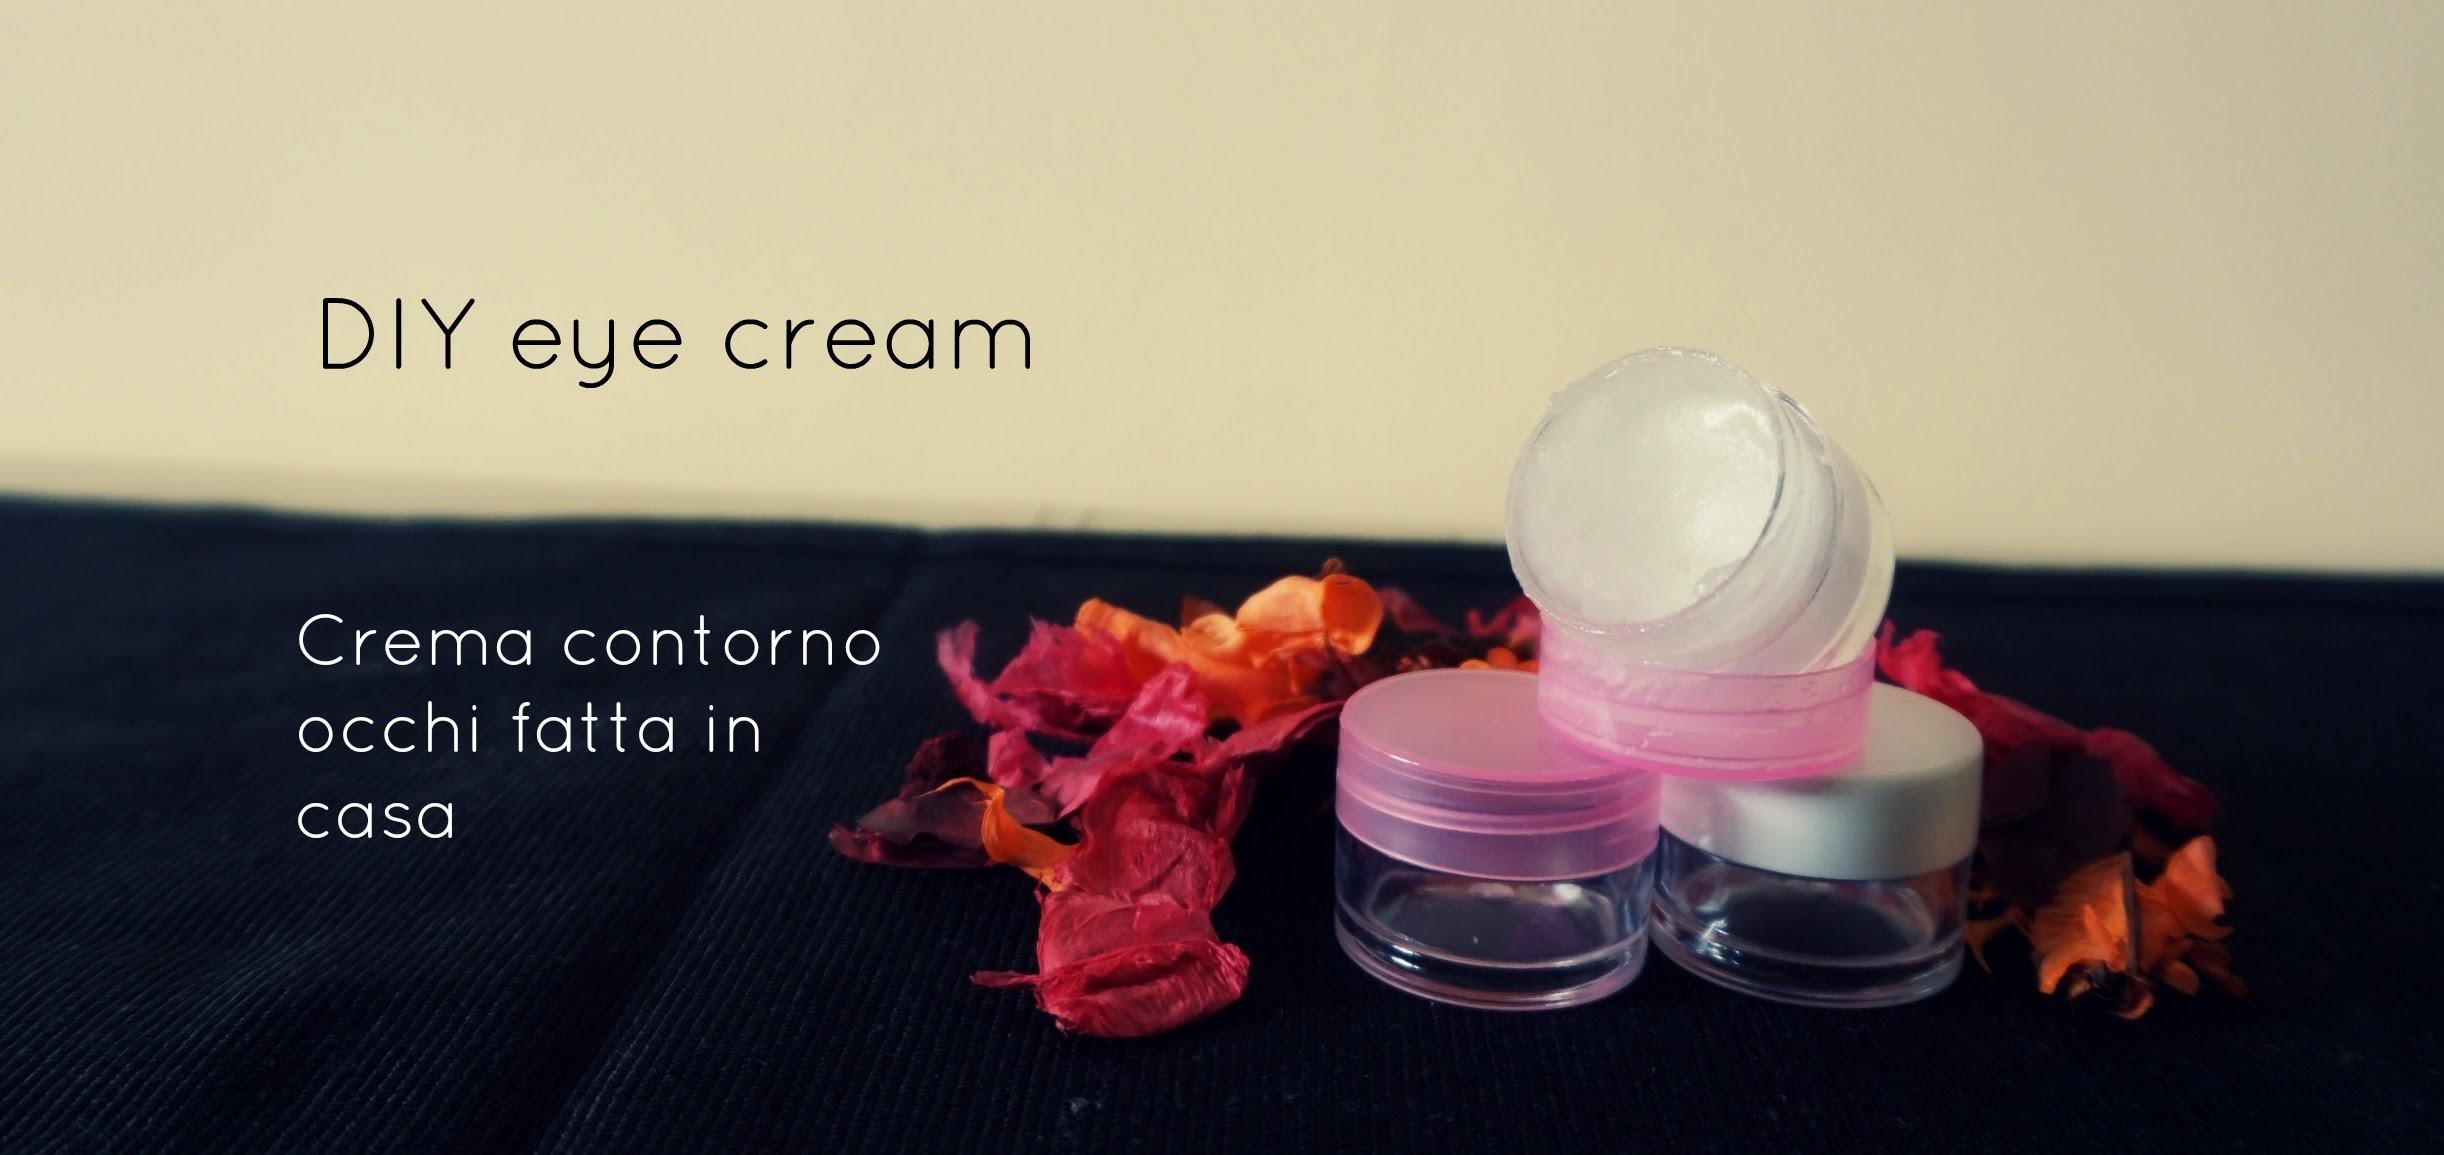 DIY homemade easy eye cream get rid of dark circles and wrinkles two ingredients, collagen boosting